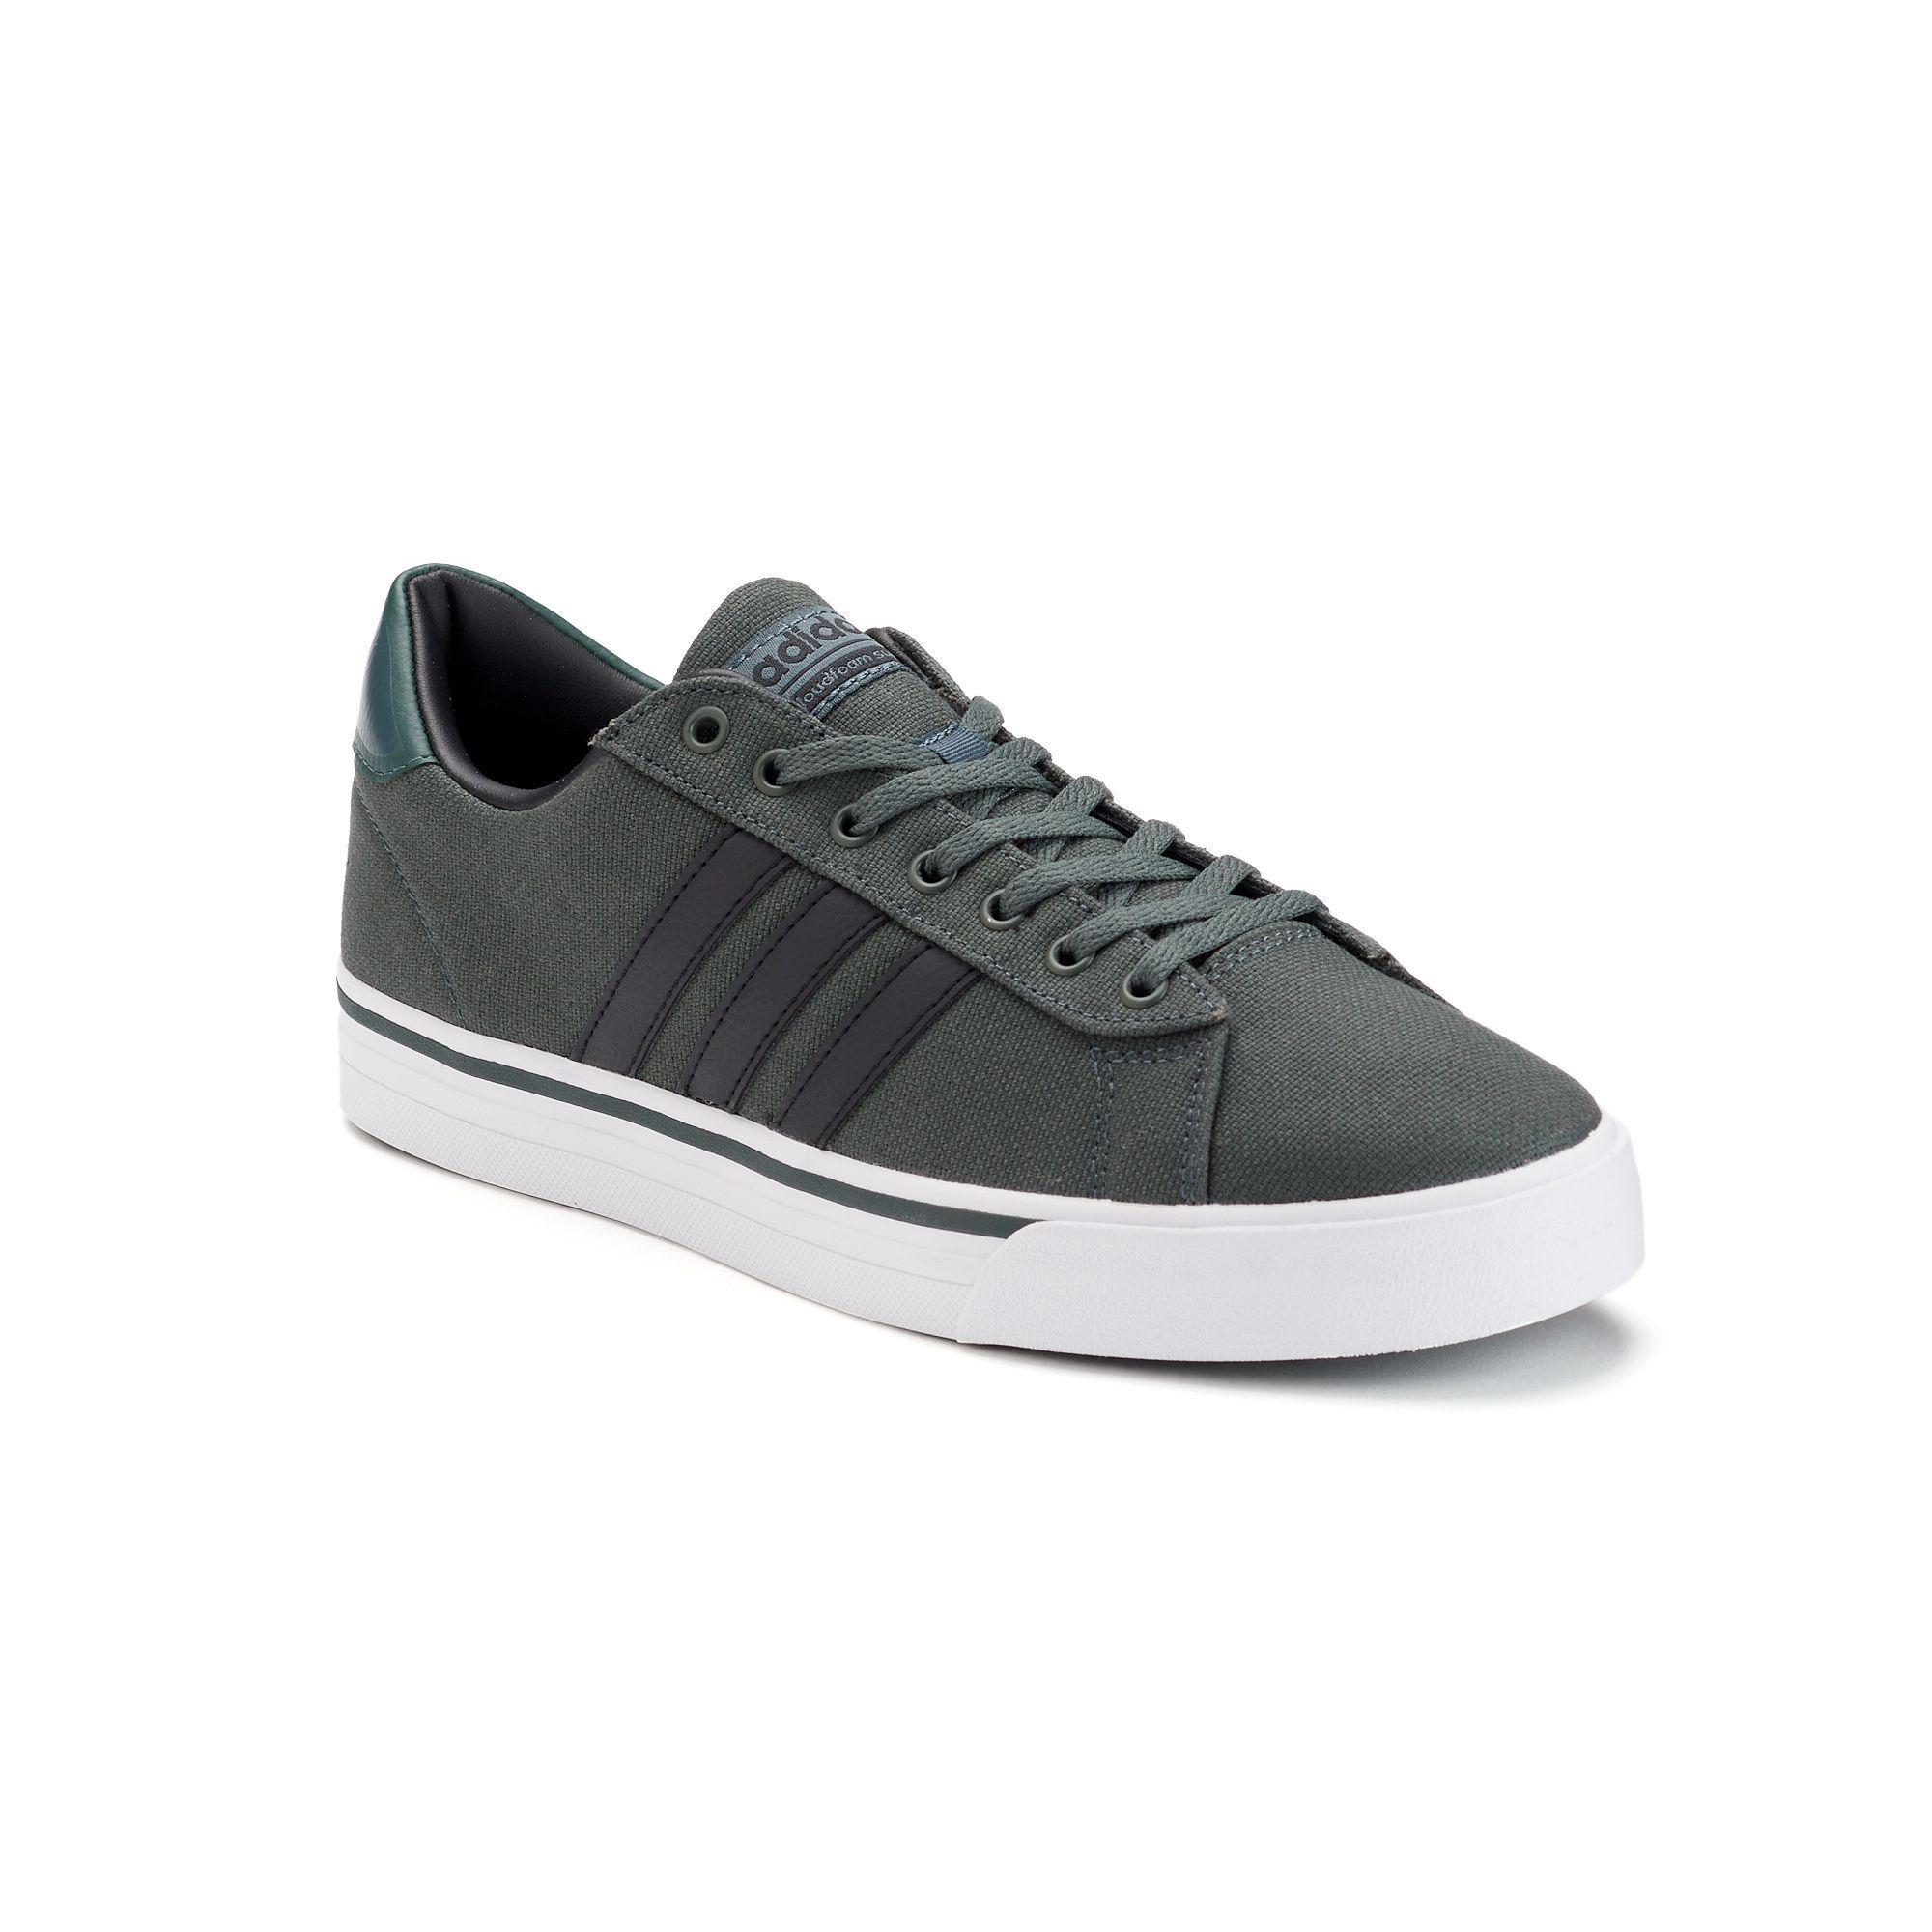 Adidas NEO Cloudfoam Super Daily Men\u0027s Shoes, Size: 10.5, Dark Green